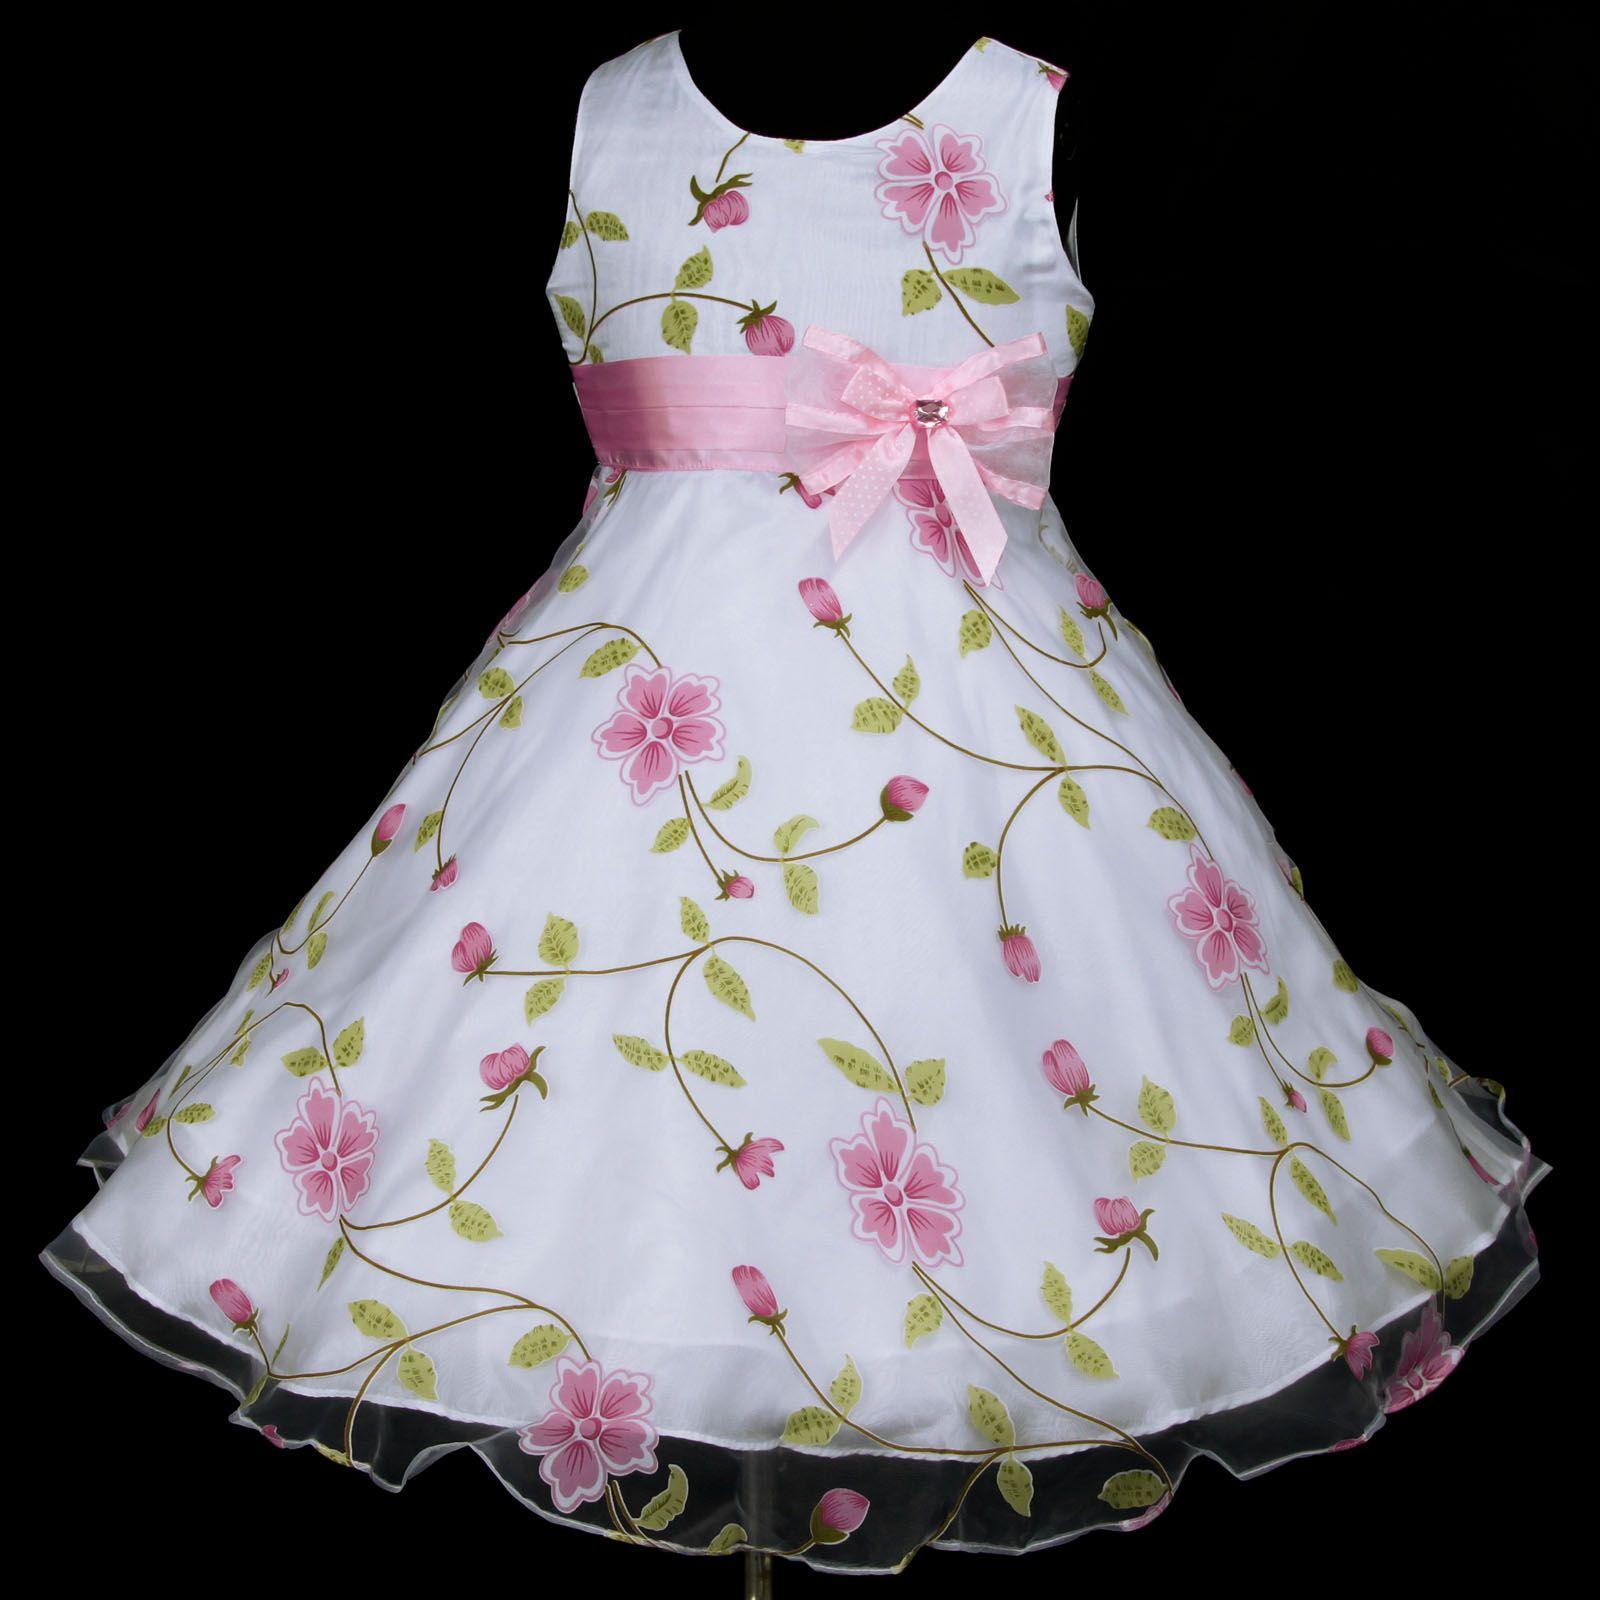 Very cute ستايل pinterest pink parties flower girl dresses